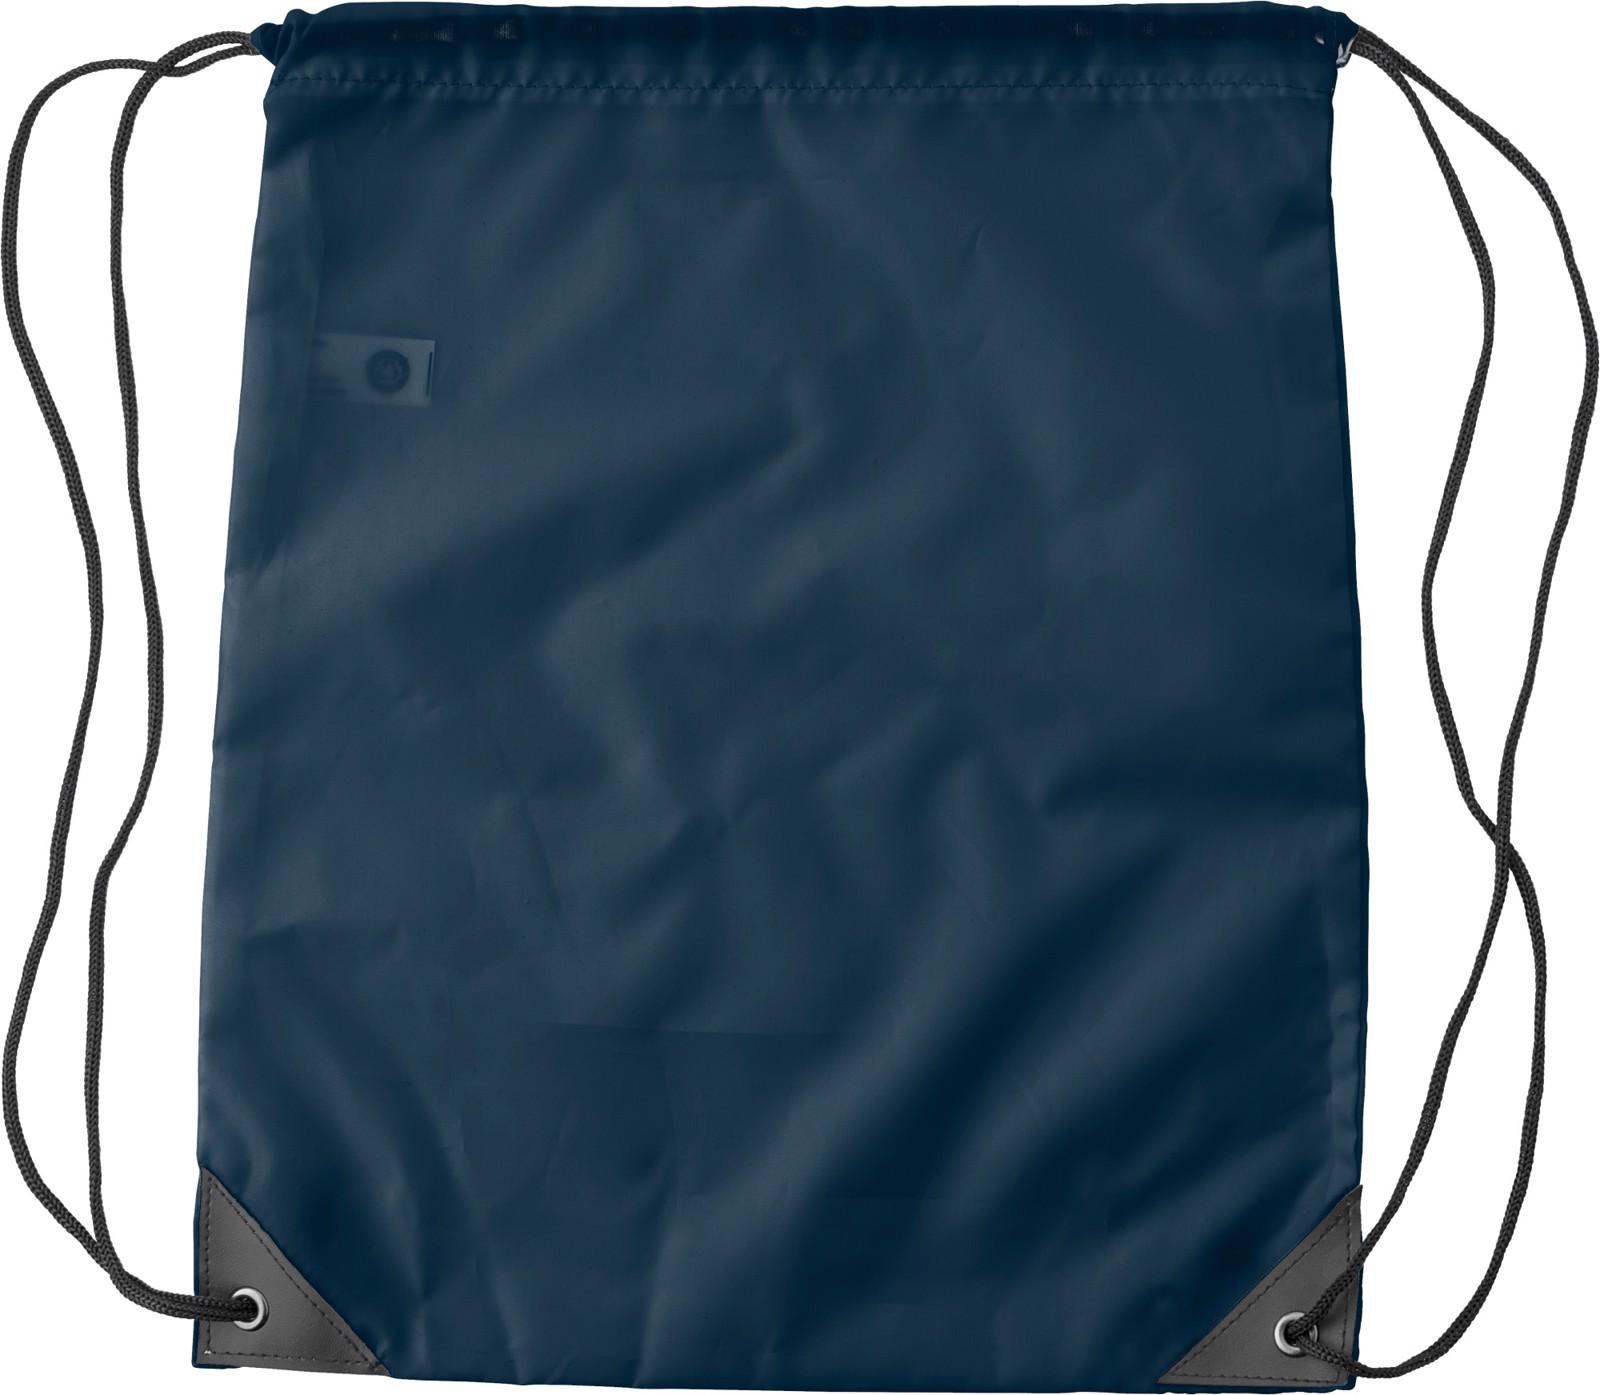 RPET polyester (190T) drawstring backpack - Blue